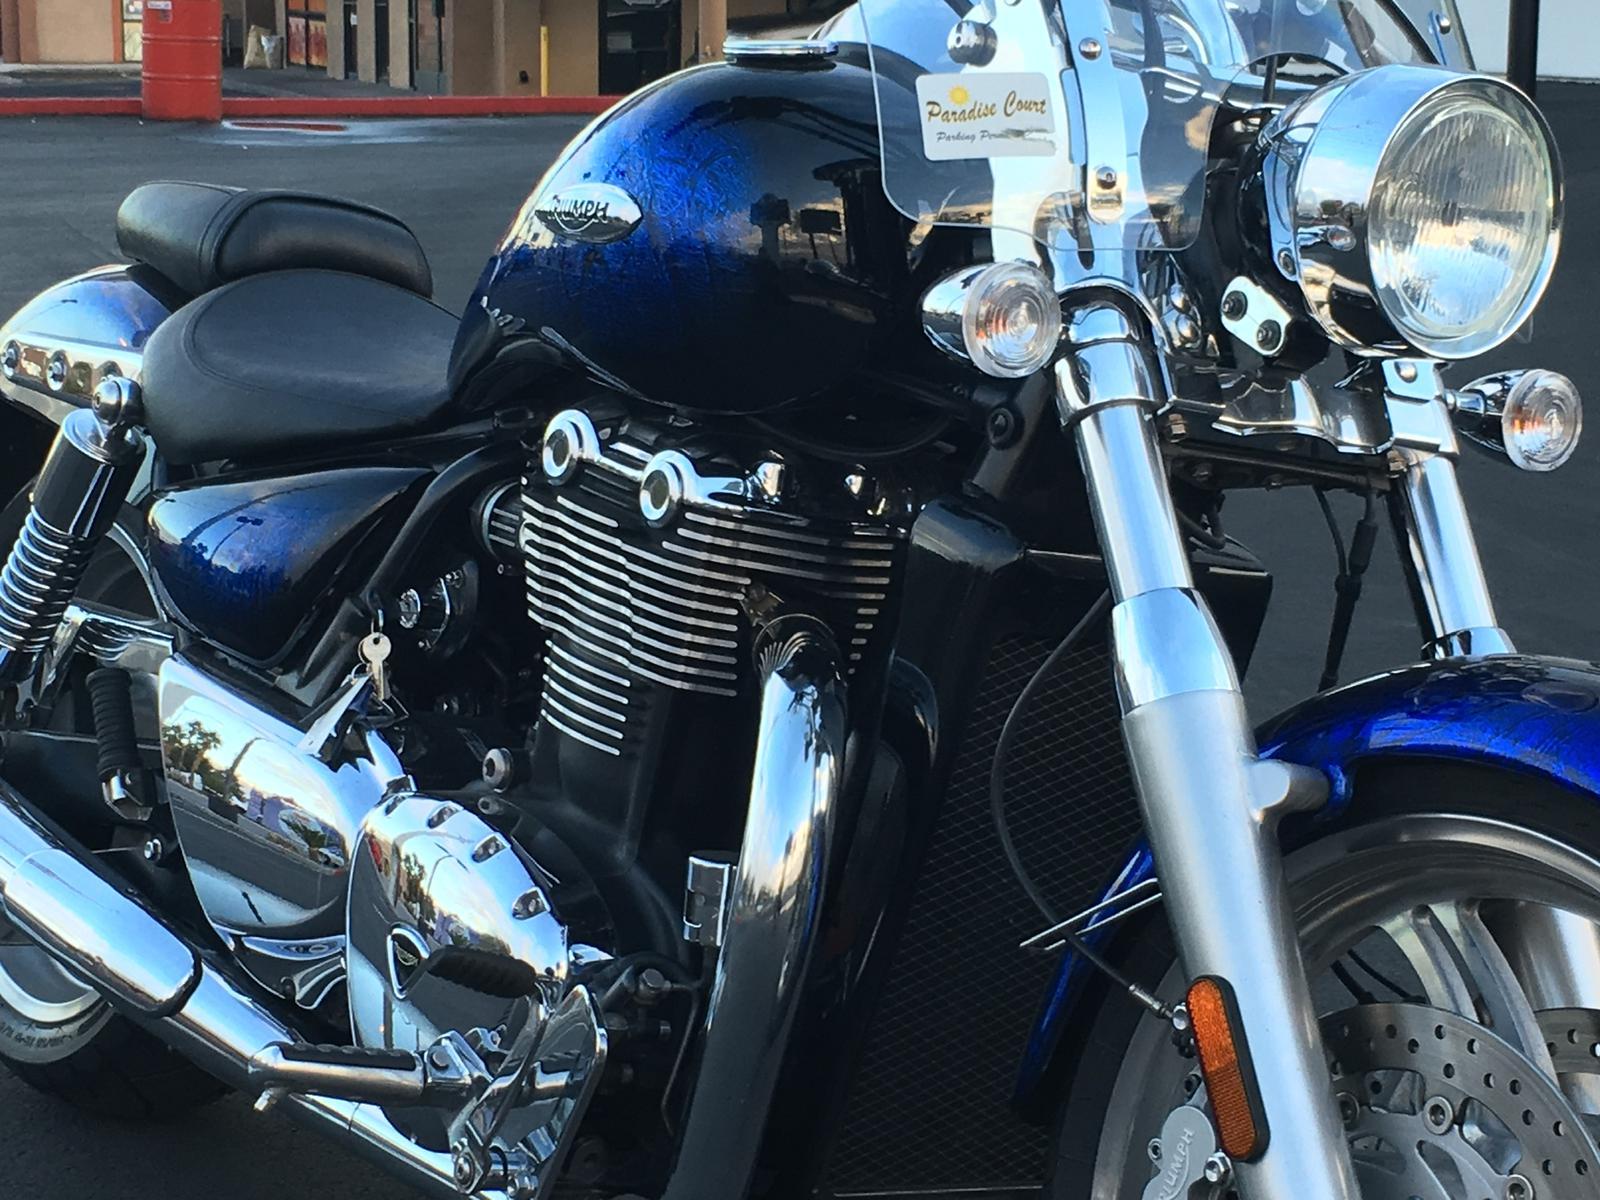 2013 Triumph Thunderbird Abs For Sale In Las Vegas Nv Freedom Euro